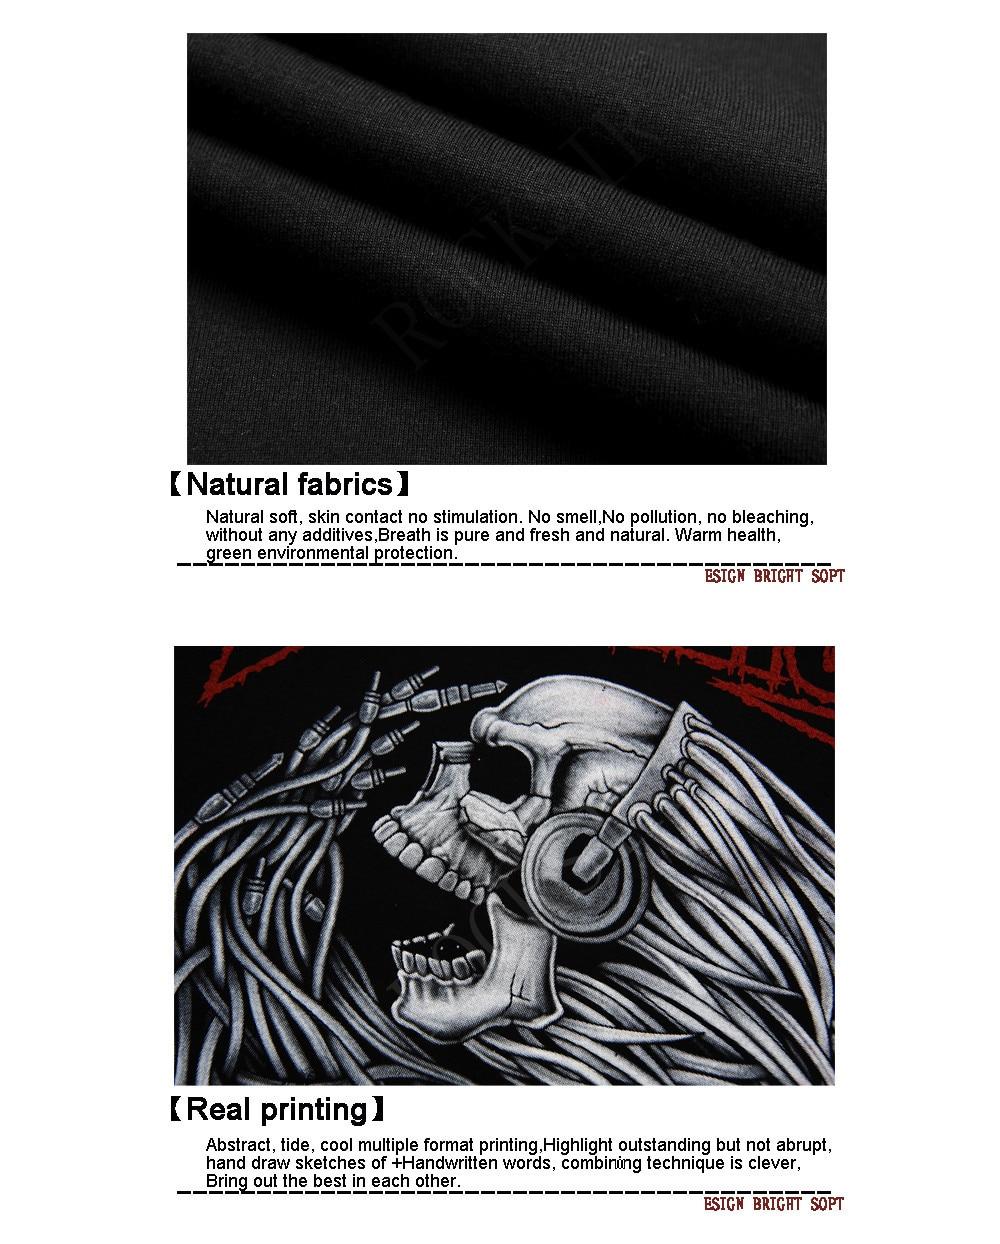 HLB1nedFFVXXXXatXVXXq6xXFXXXR - [Mne bone] Tee Men Black T-Shirt 100% Cotton Metallica Skull Print Heavy Metal Rock Hip Hop Clothing Black short T shirts